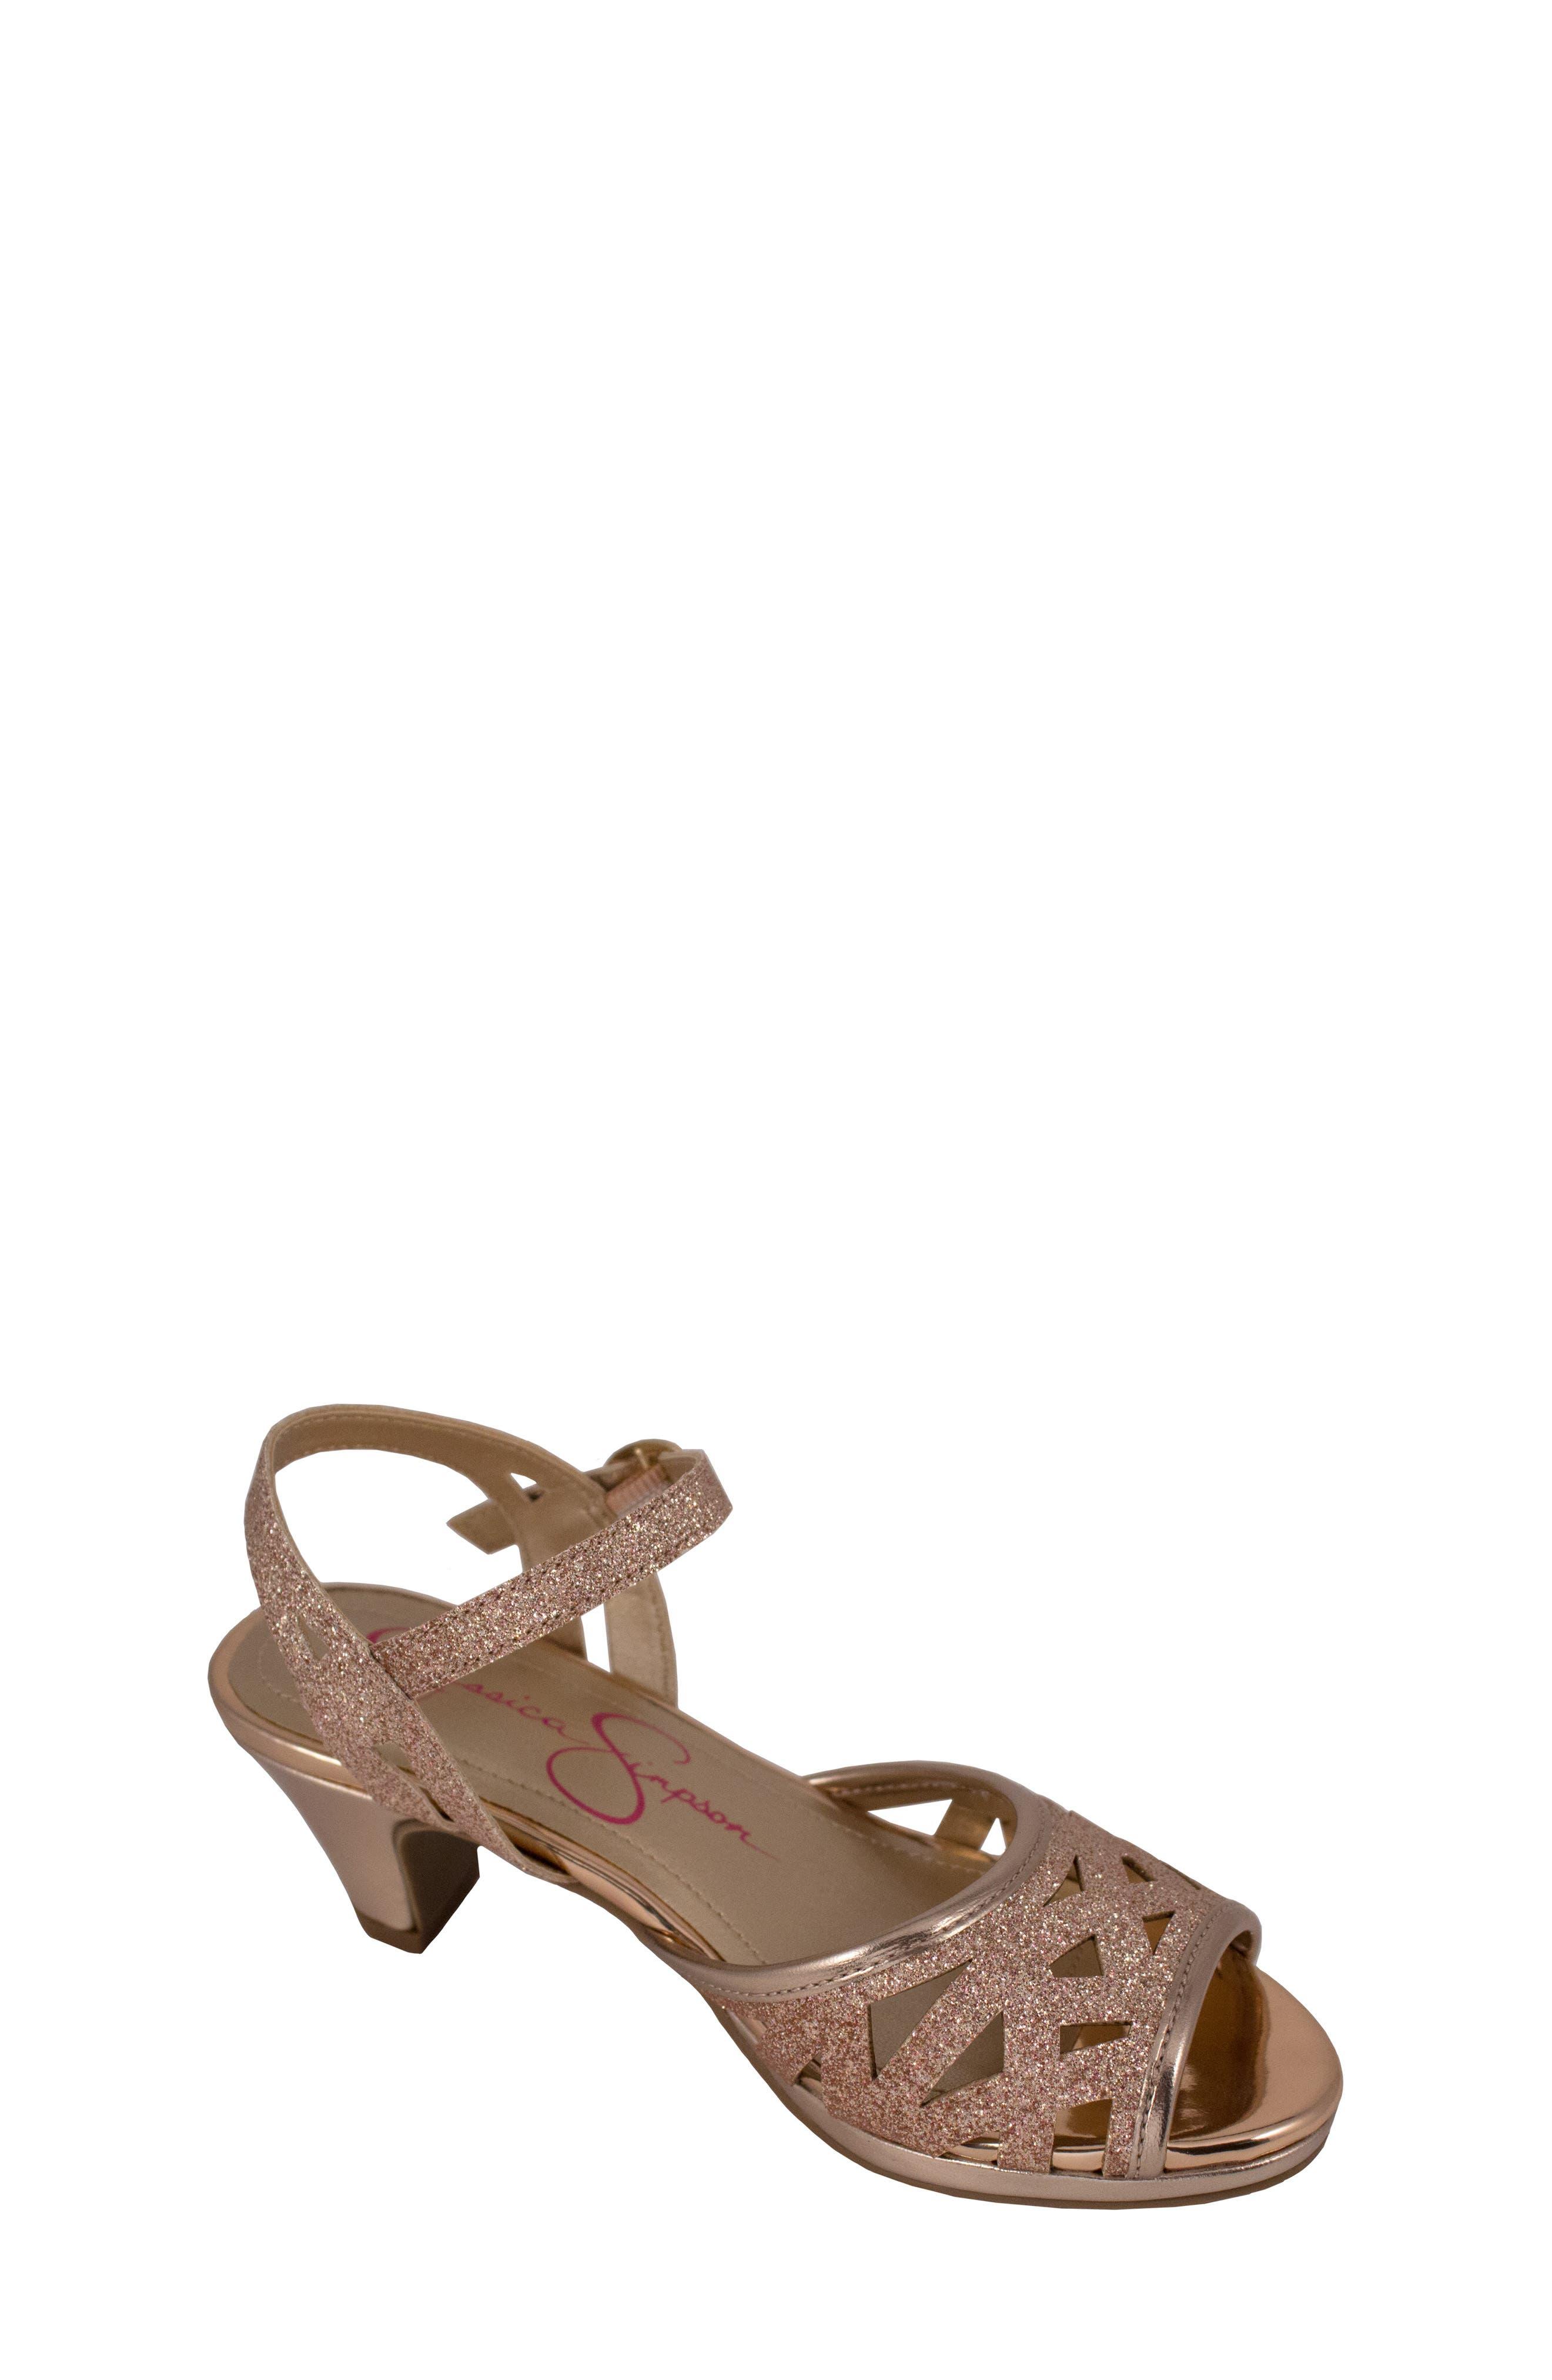 JESSICA SIMPSON,                             Glitter Sandal,                             Main thumbnail 1, color,                             ROSE GOLD